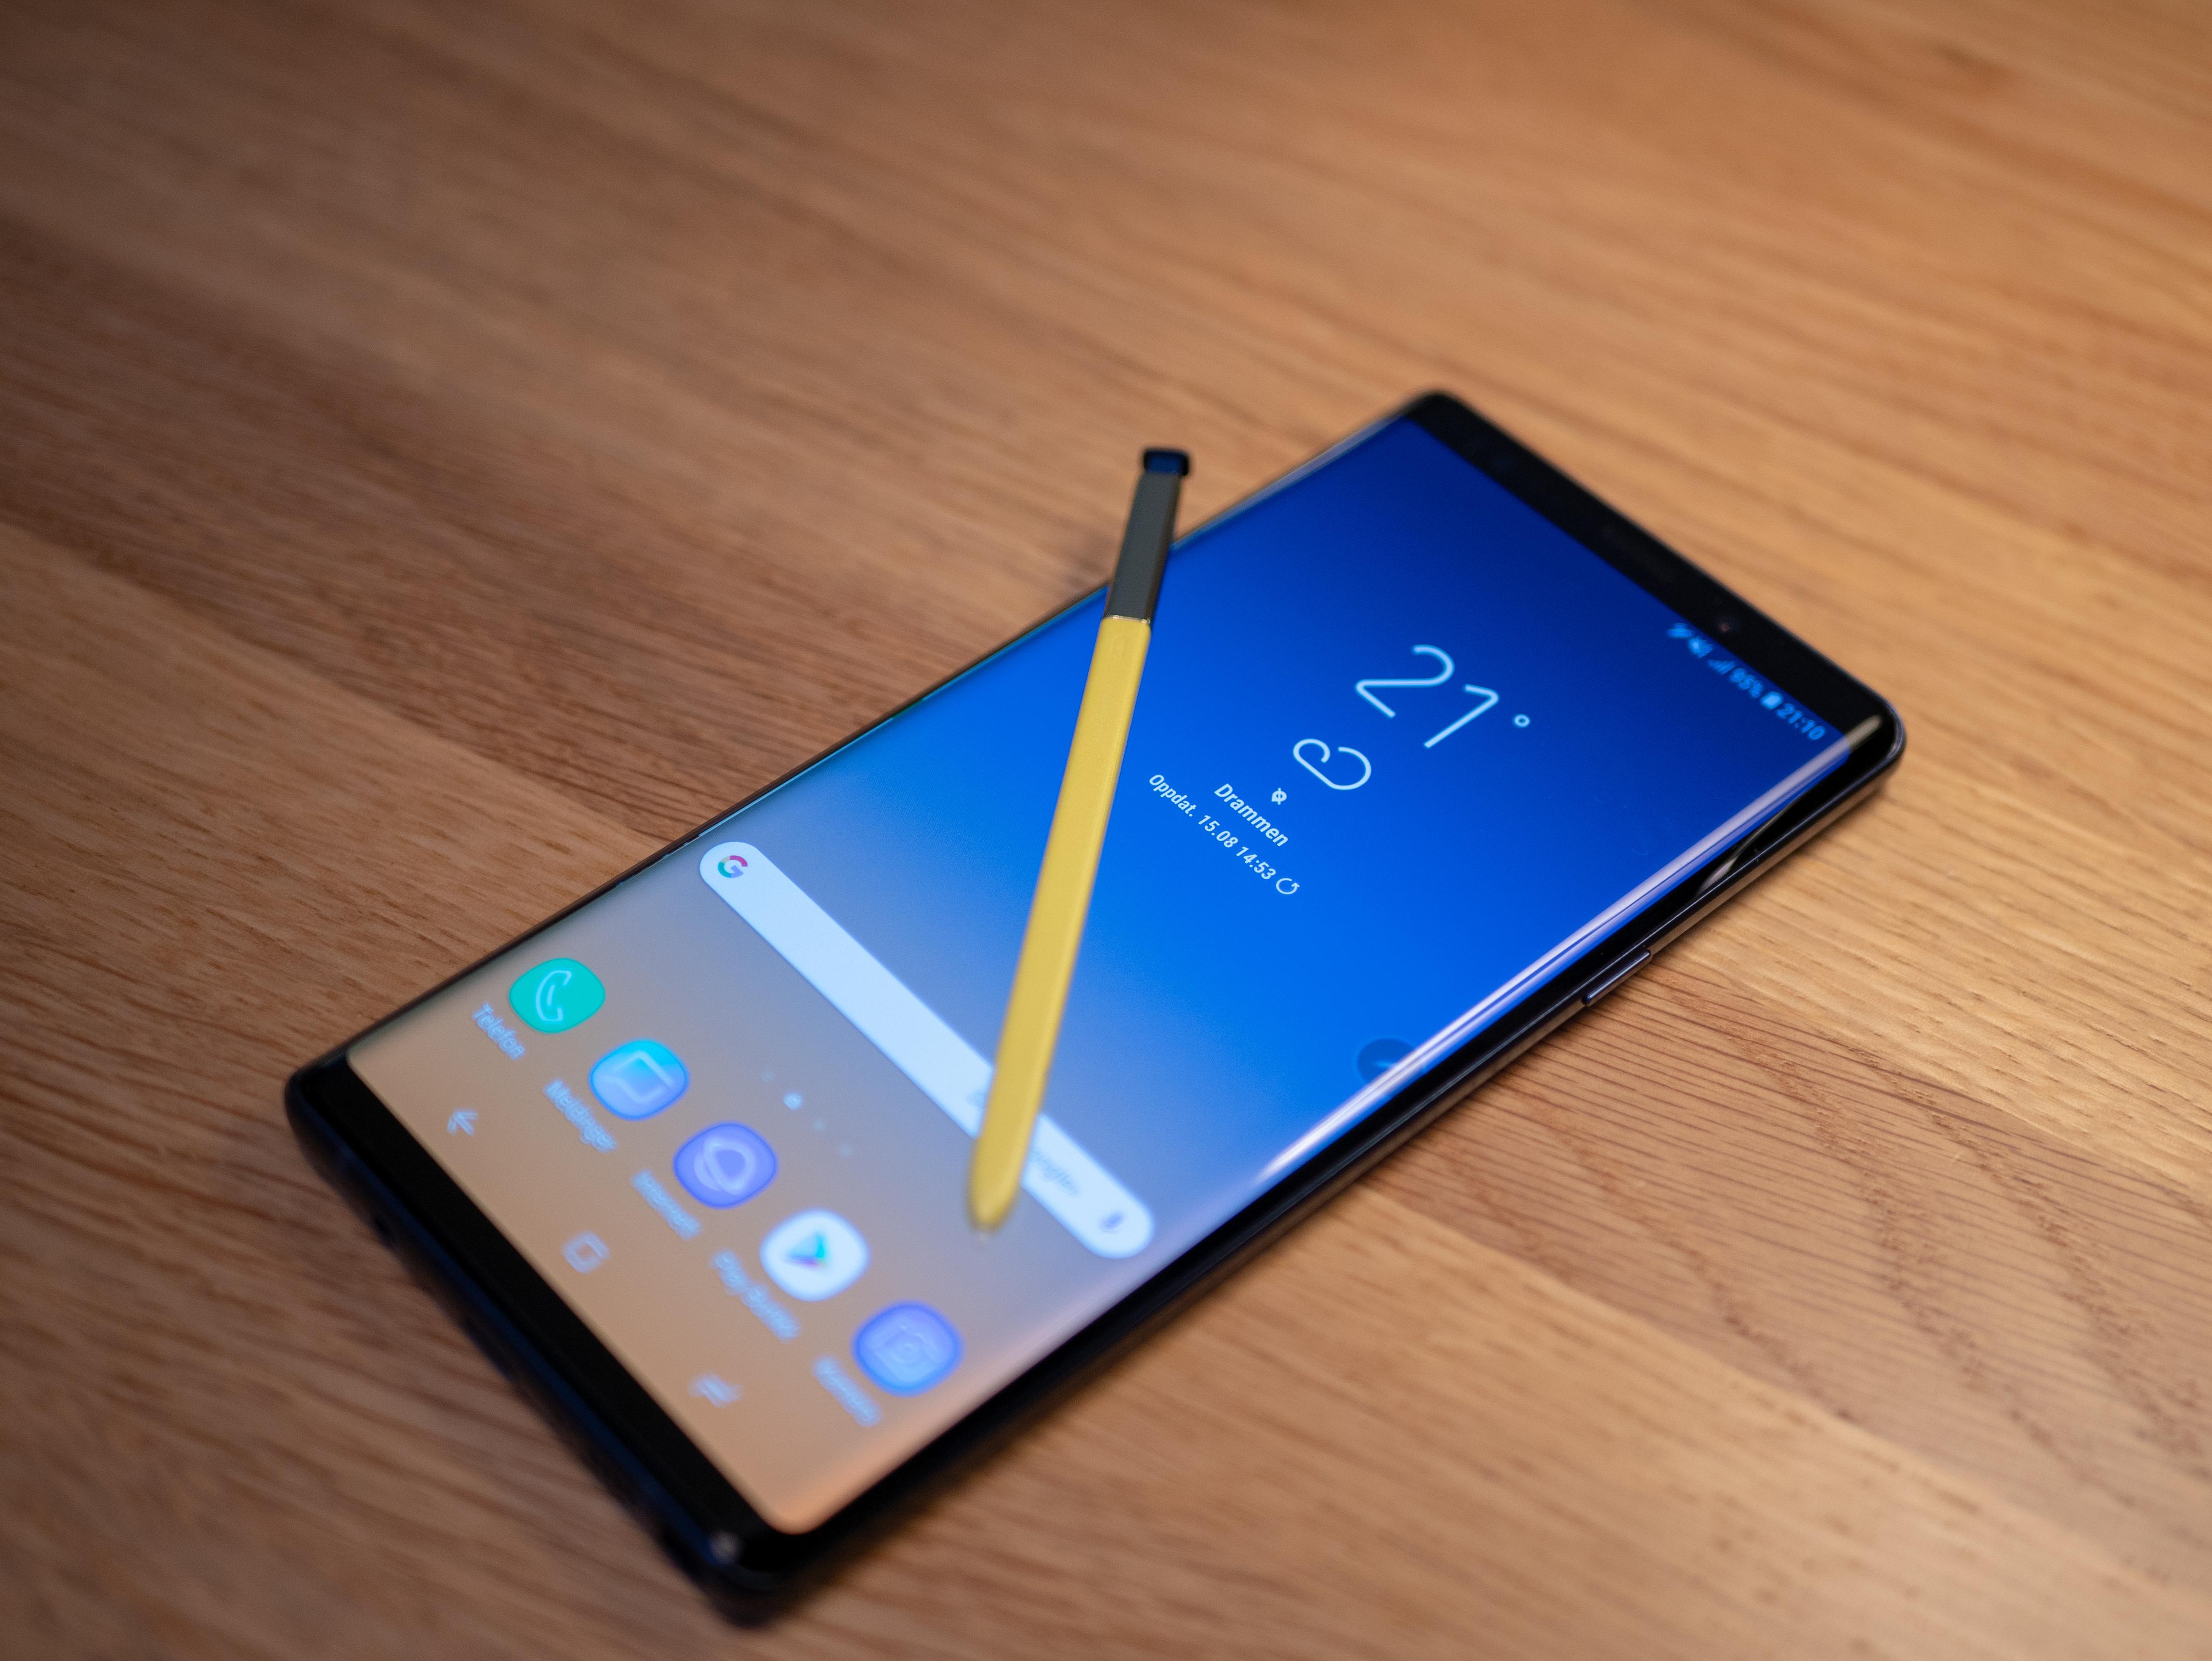 Galaxy Note 9 tok fyr i veska til en kvinne